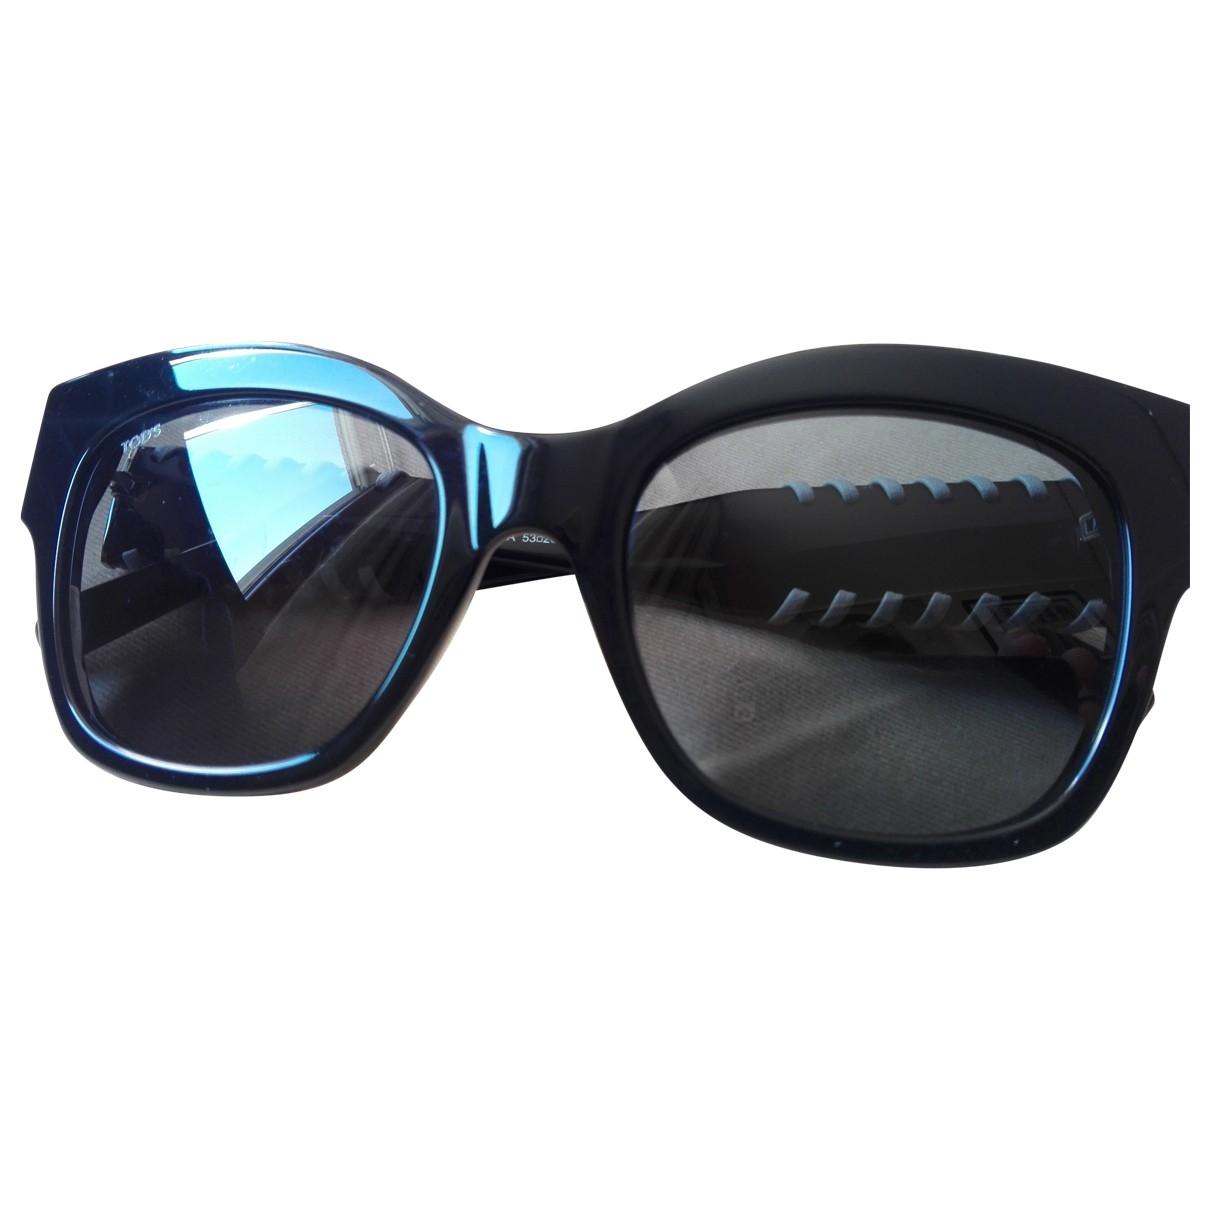 Gafas oversize Tods